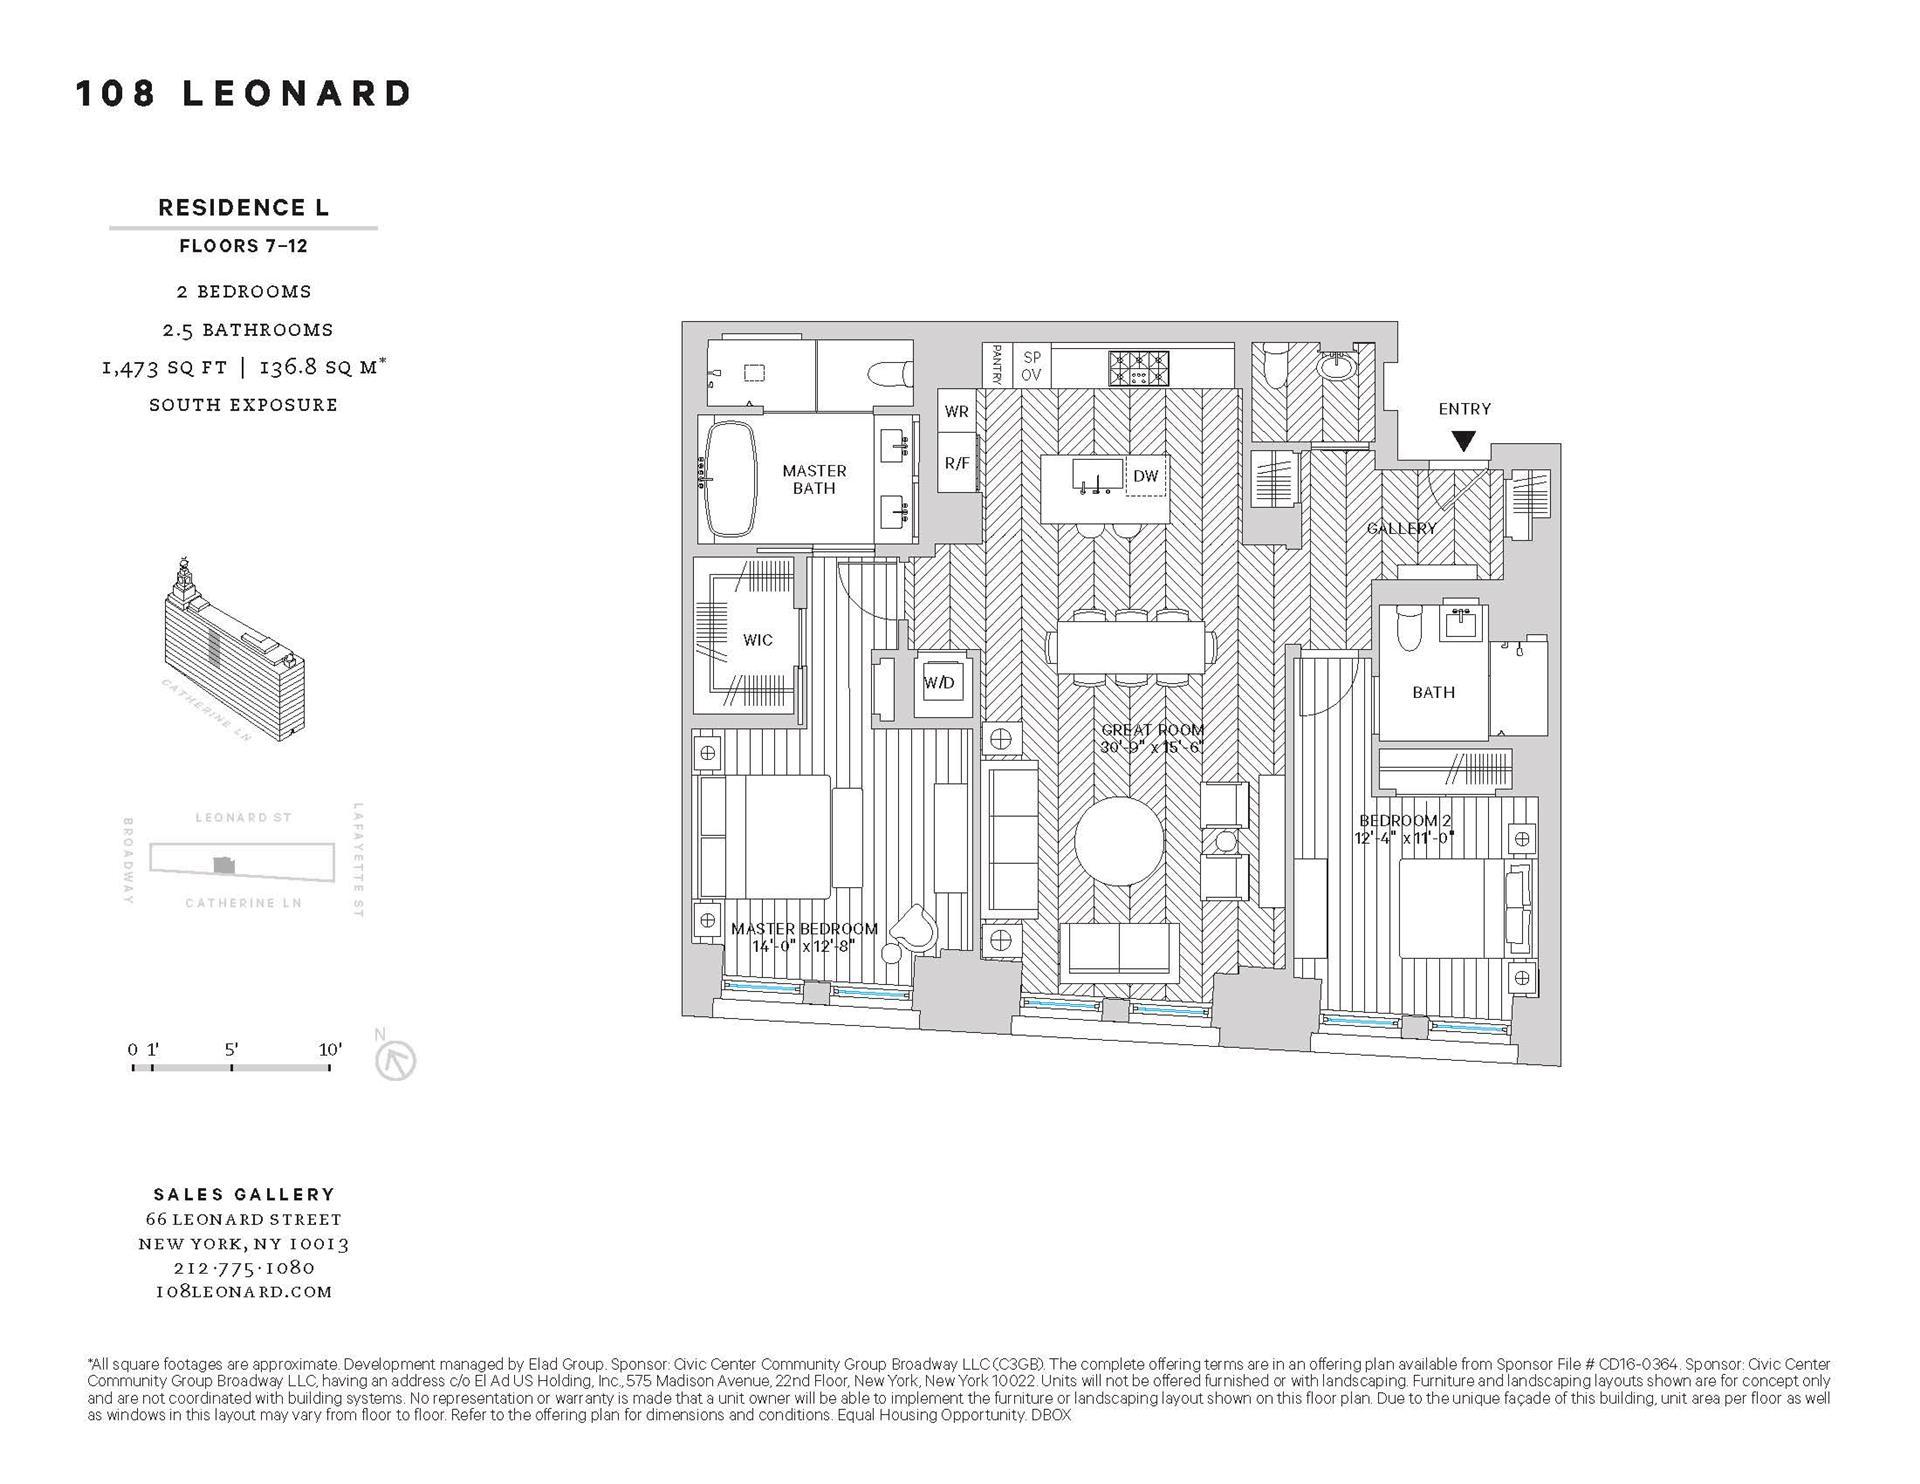 Floor plan of 108 Leonard St, 10L - TriBeCa, New York